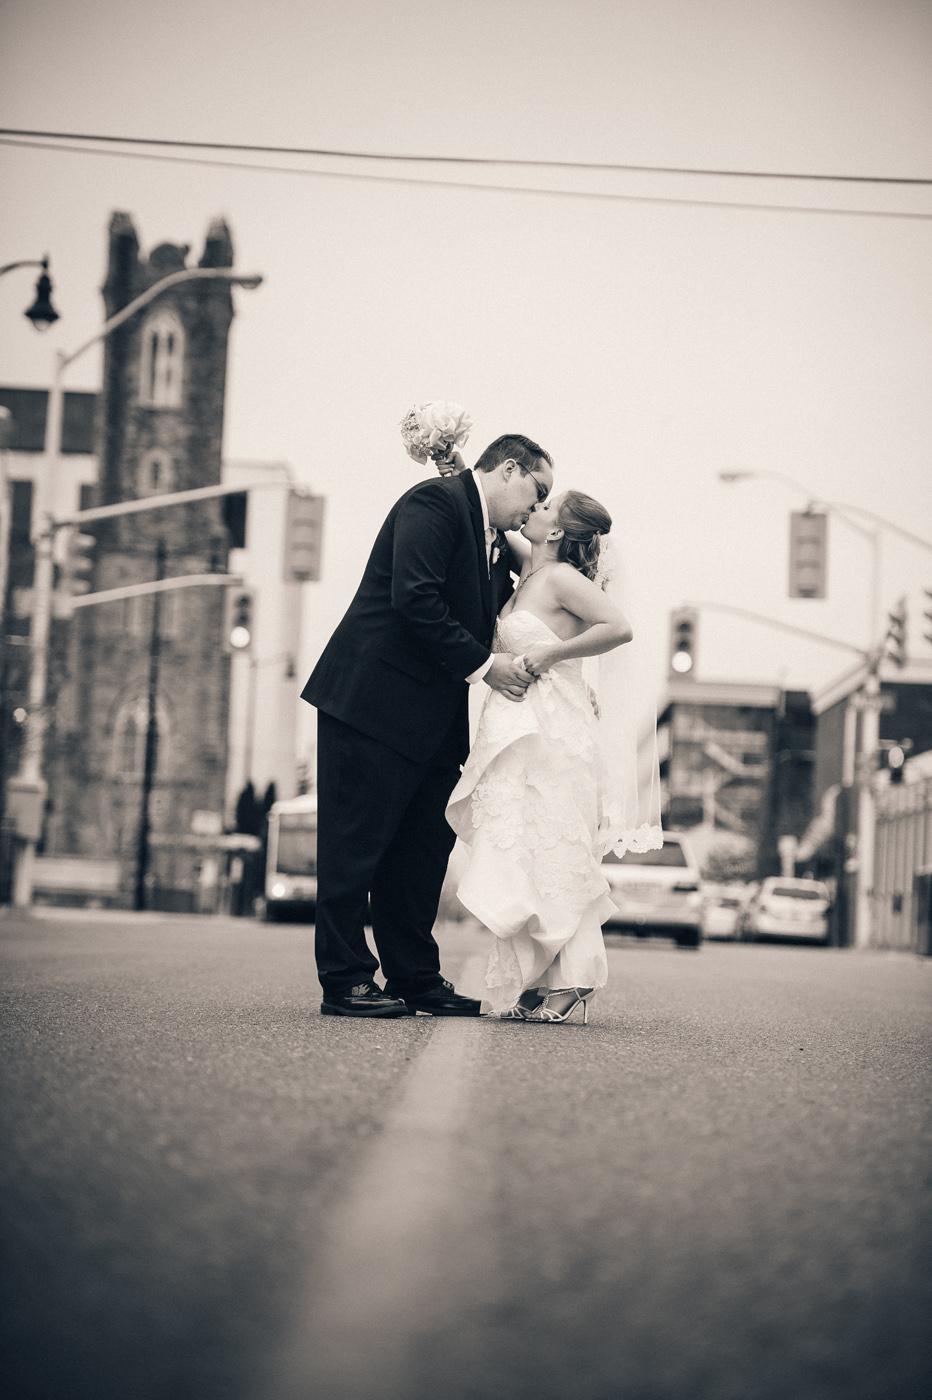 ss_weddingbest-6.jpg